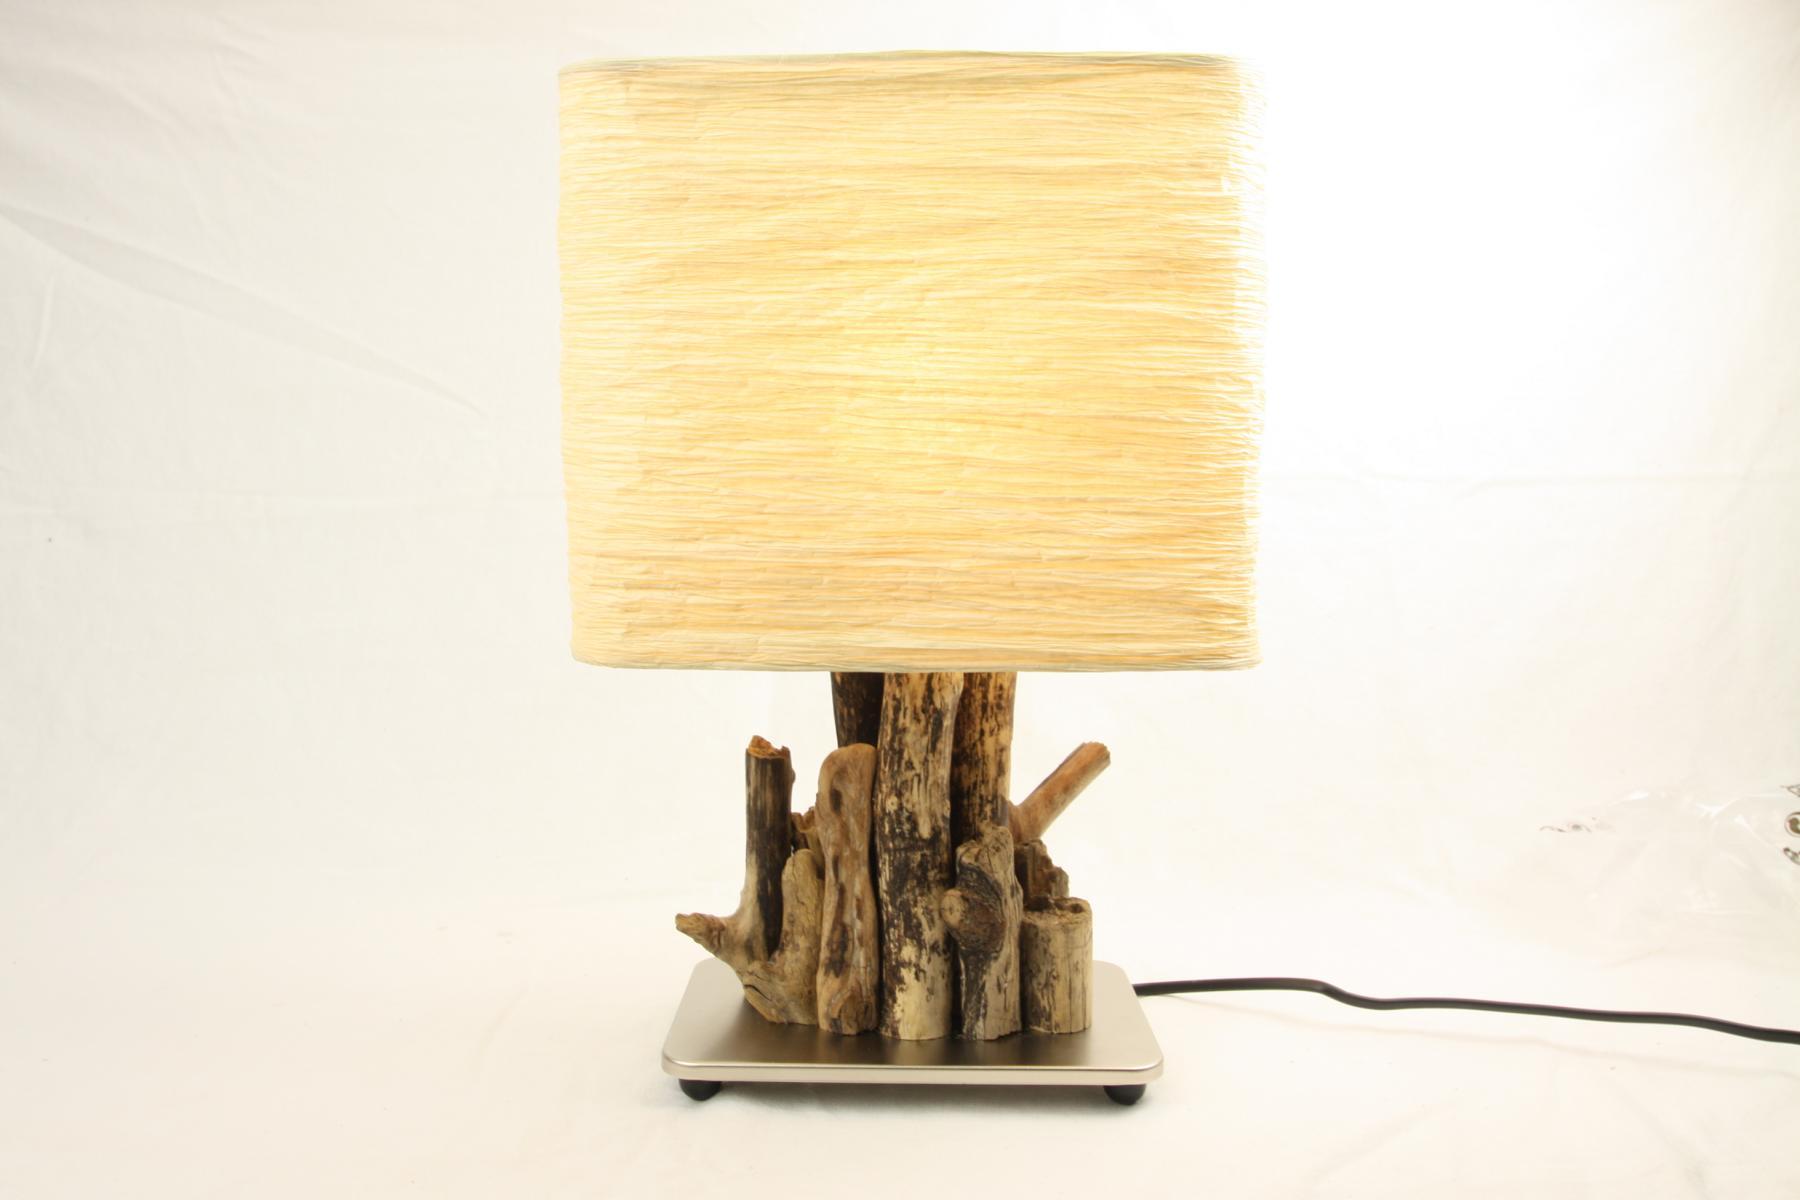 einmalige treibholz lampen schwemmholz lampen. Black Bedroom Furniture Sets. Home Design Ideas